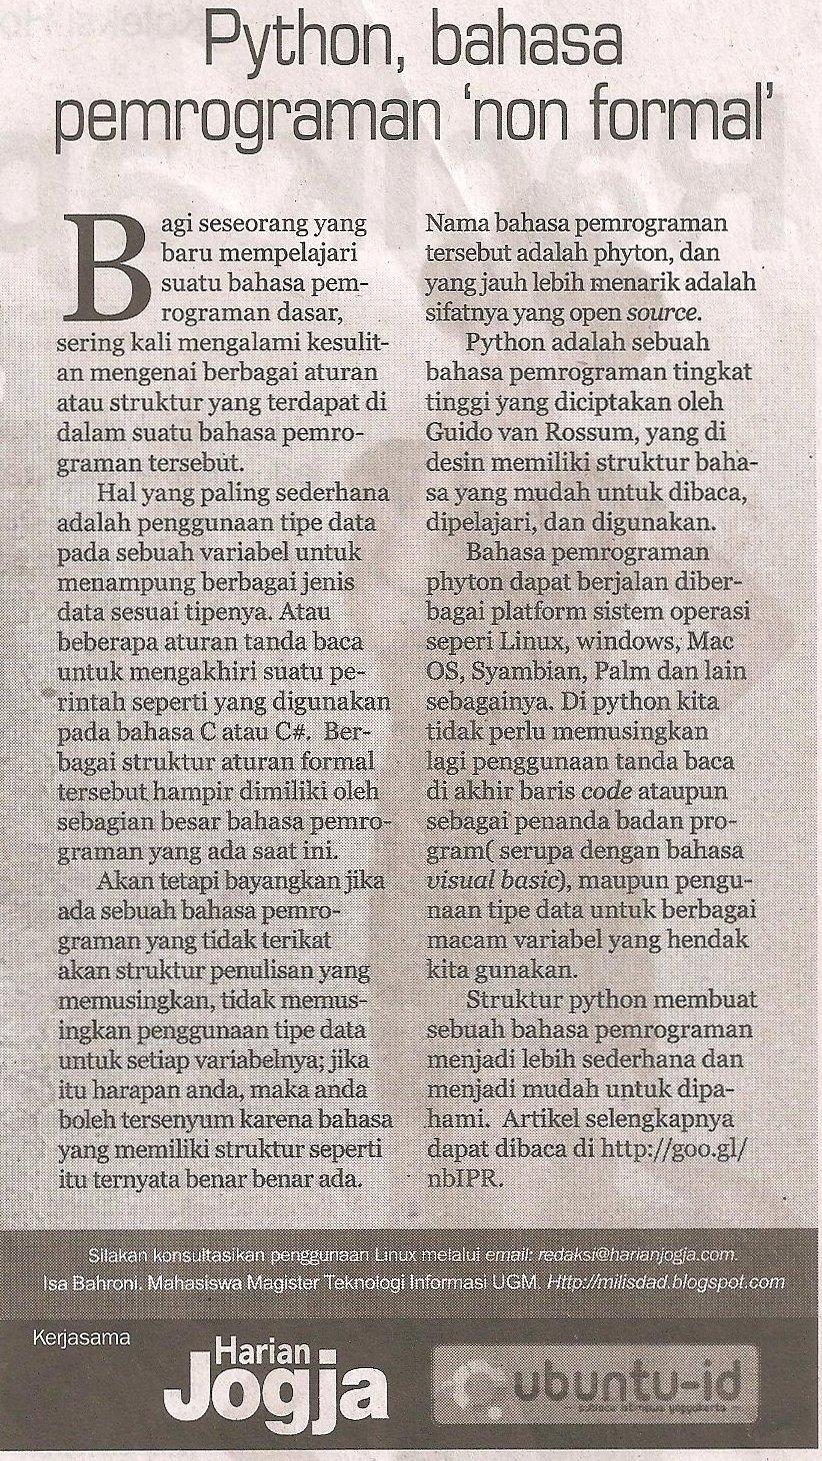 Kliping Harian Jogja 12 Desember 2010 Halaman 23 Dedy Selalu Milisdad